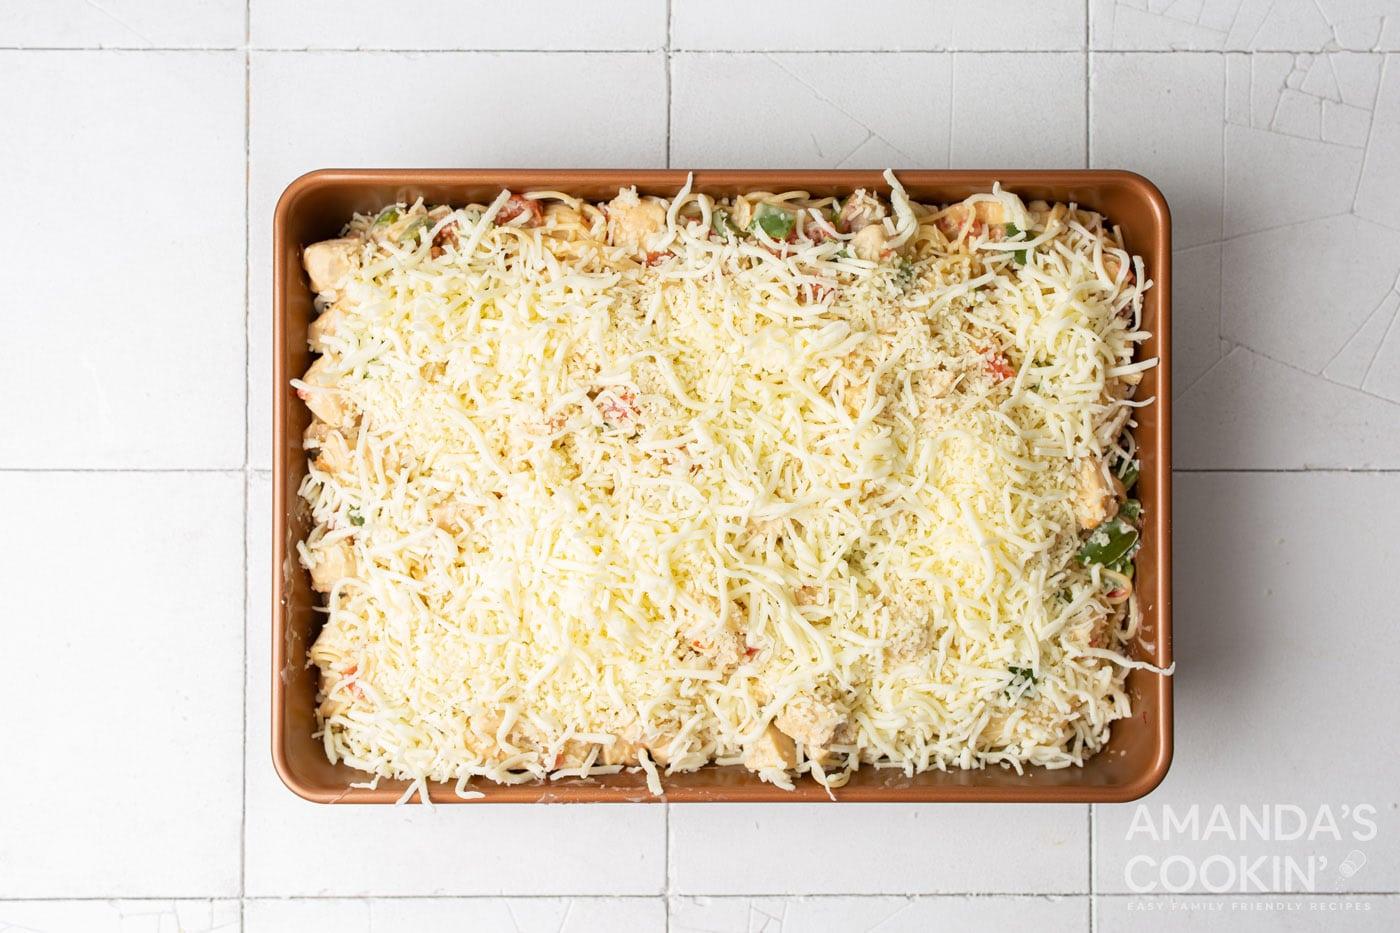 shredded cheese on top of chicken spaghetti casserole